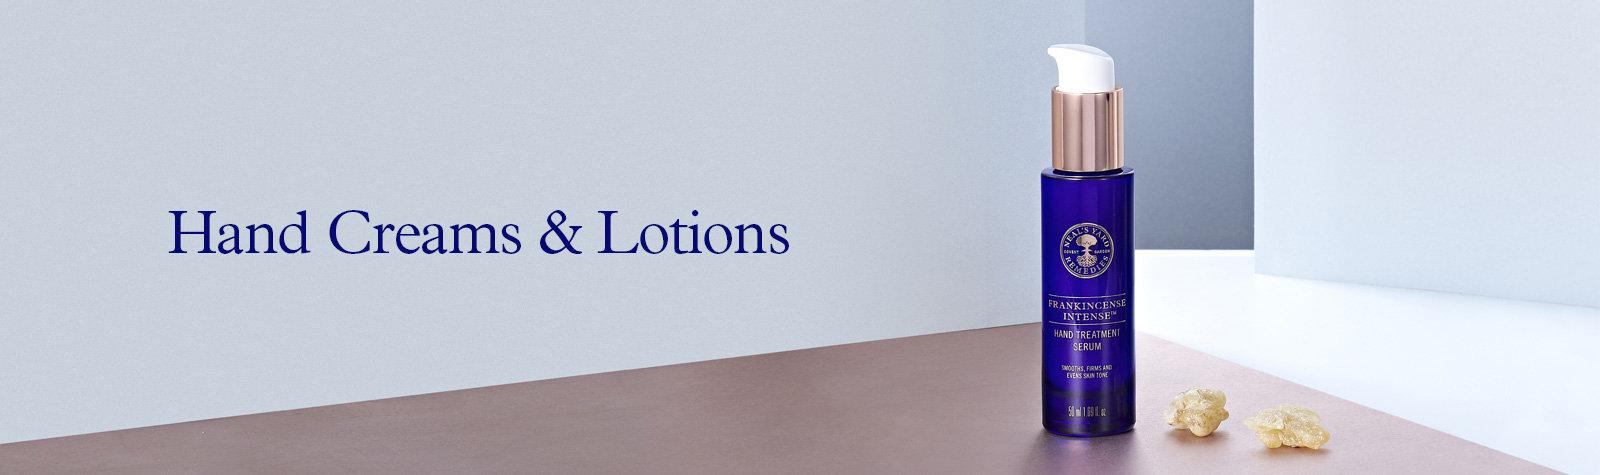 Hand Creams & Lotions.jpg